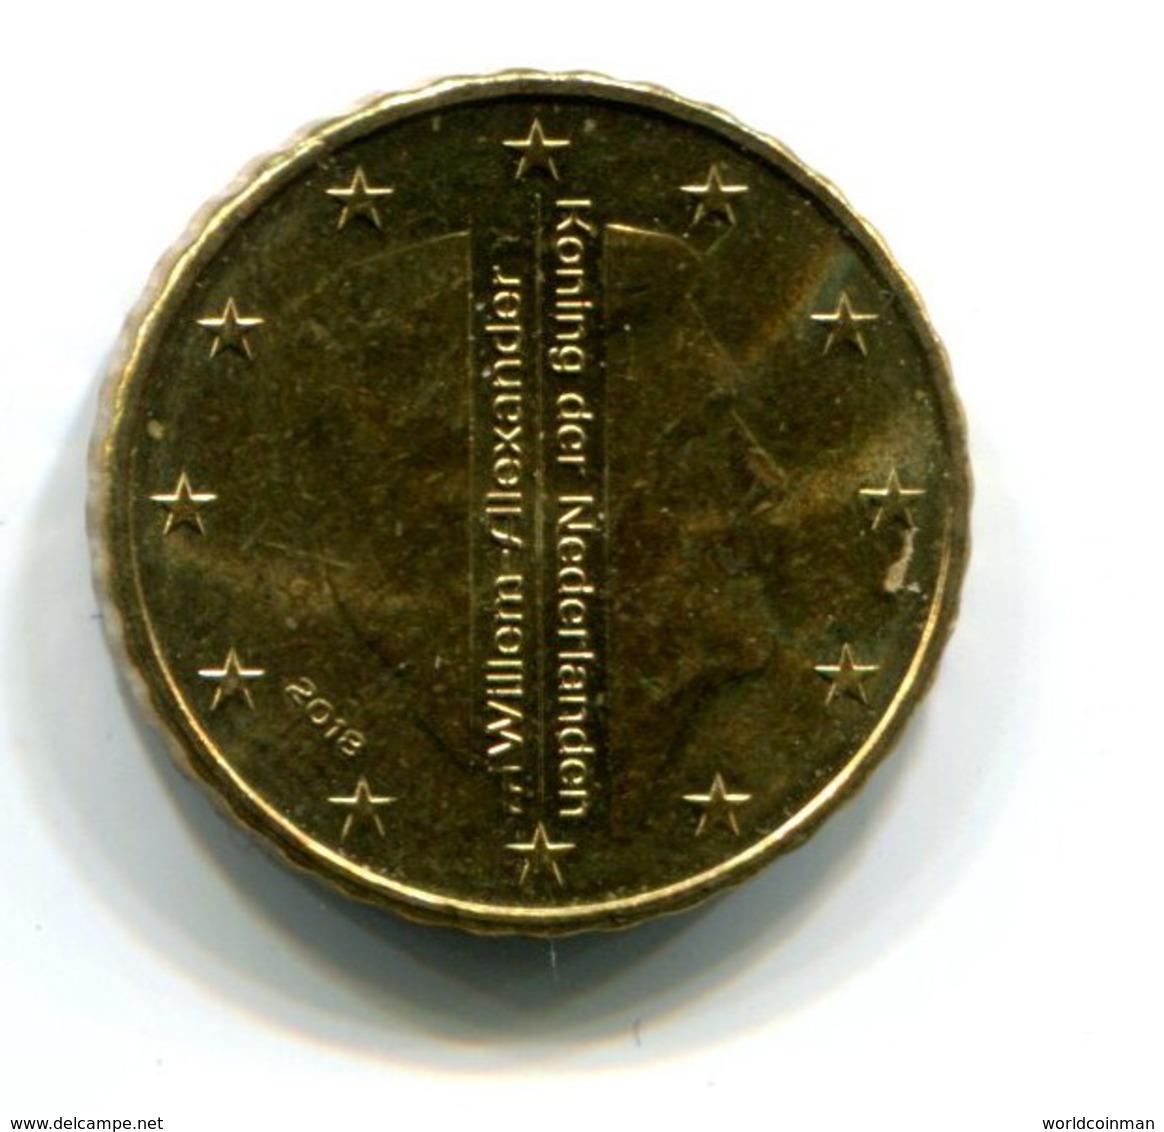 2018 Netherlands 10 Cent Coin - Netherlands